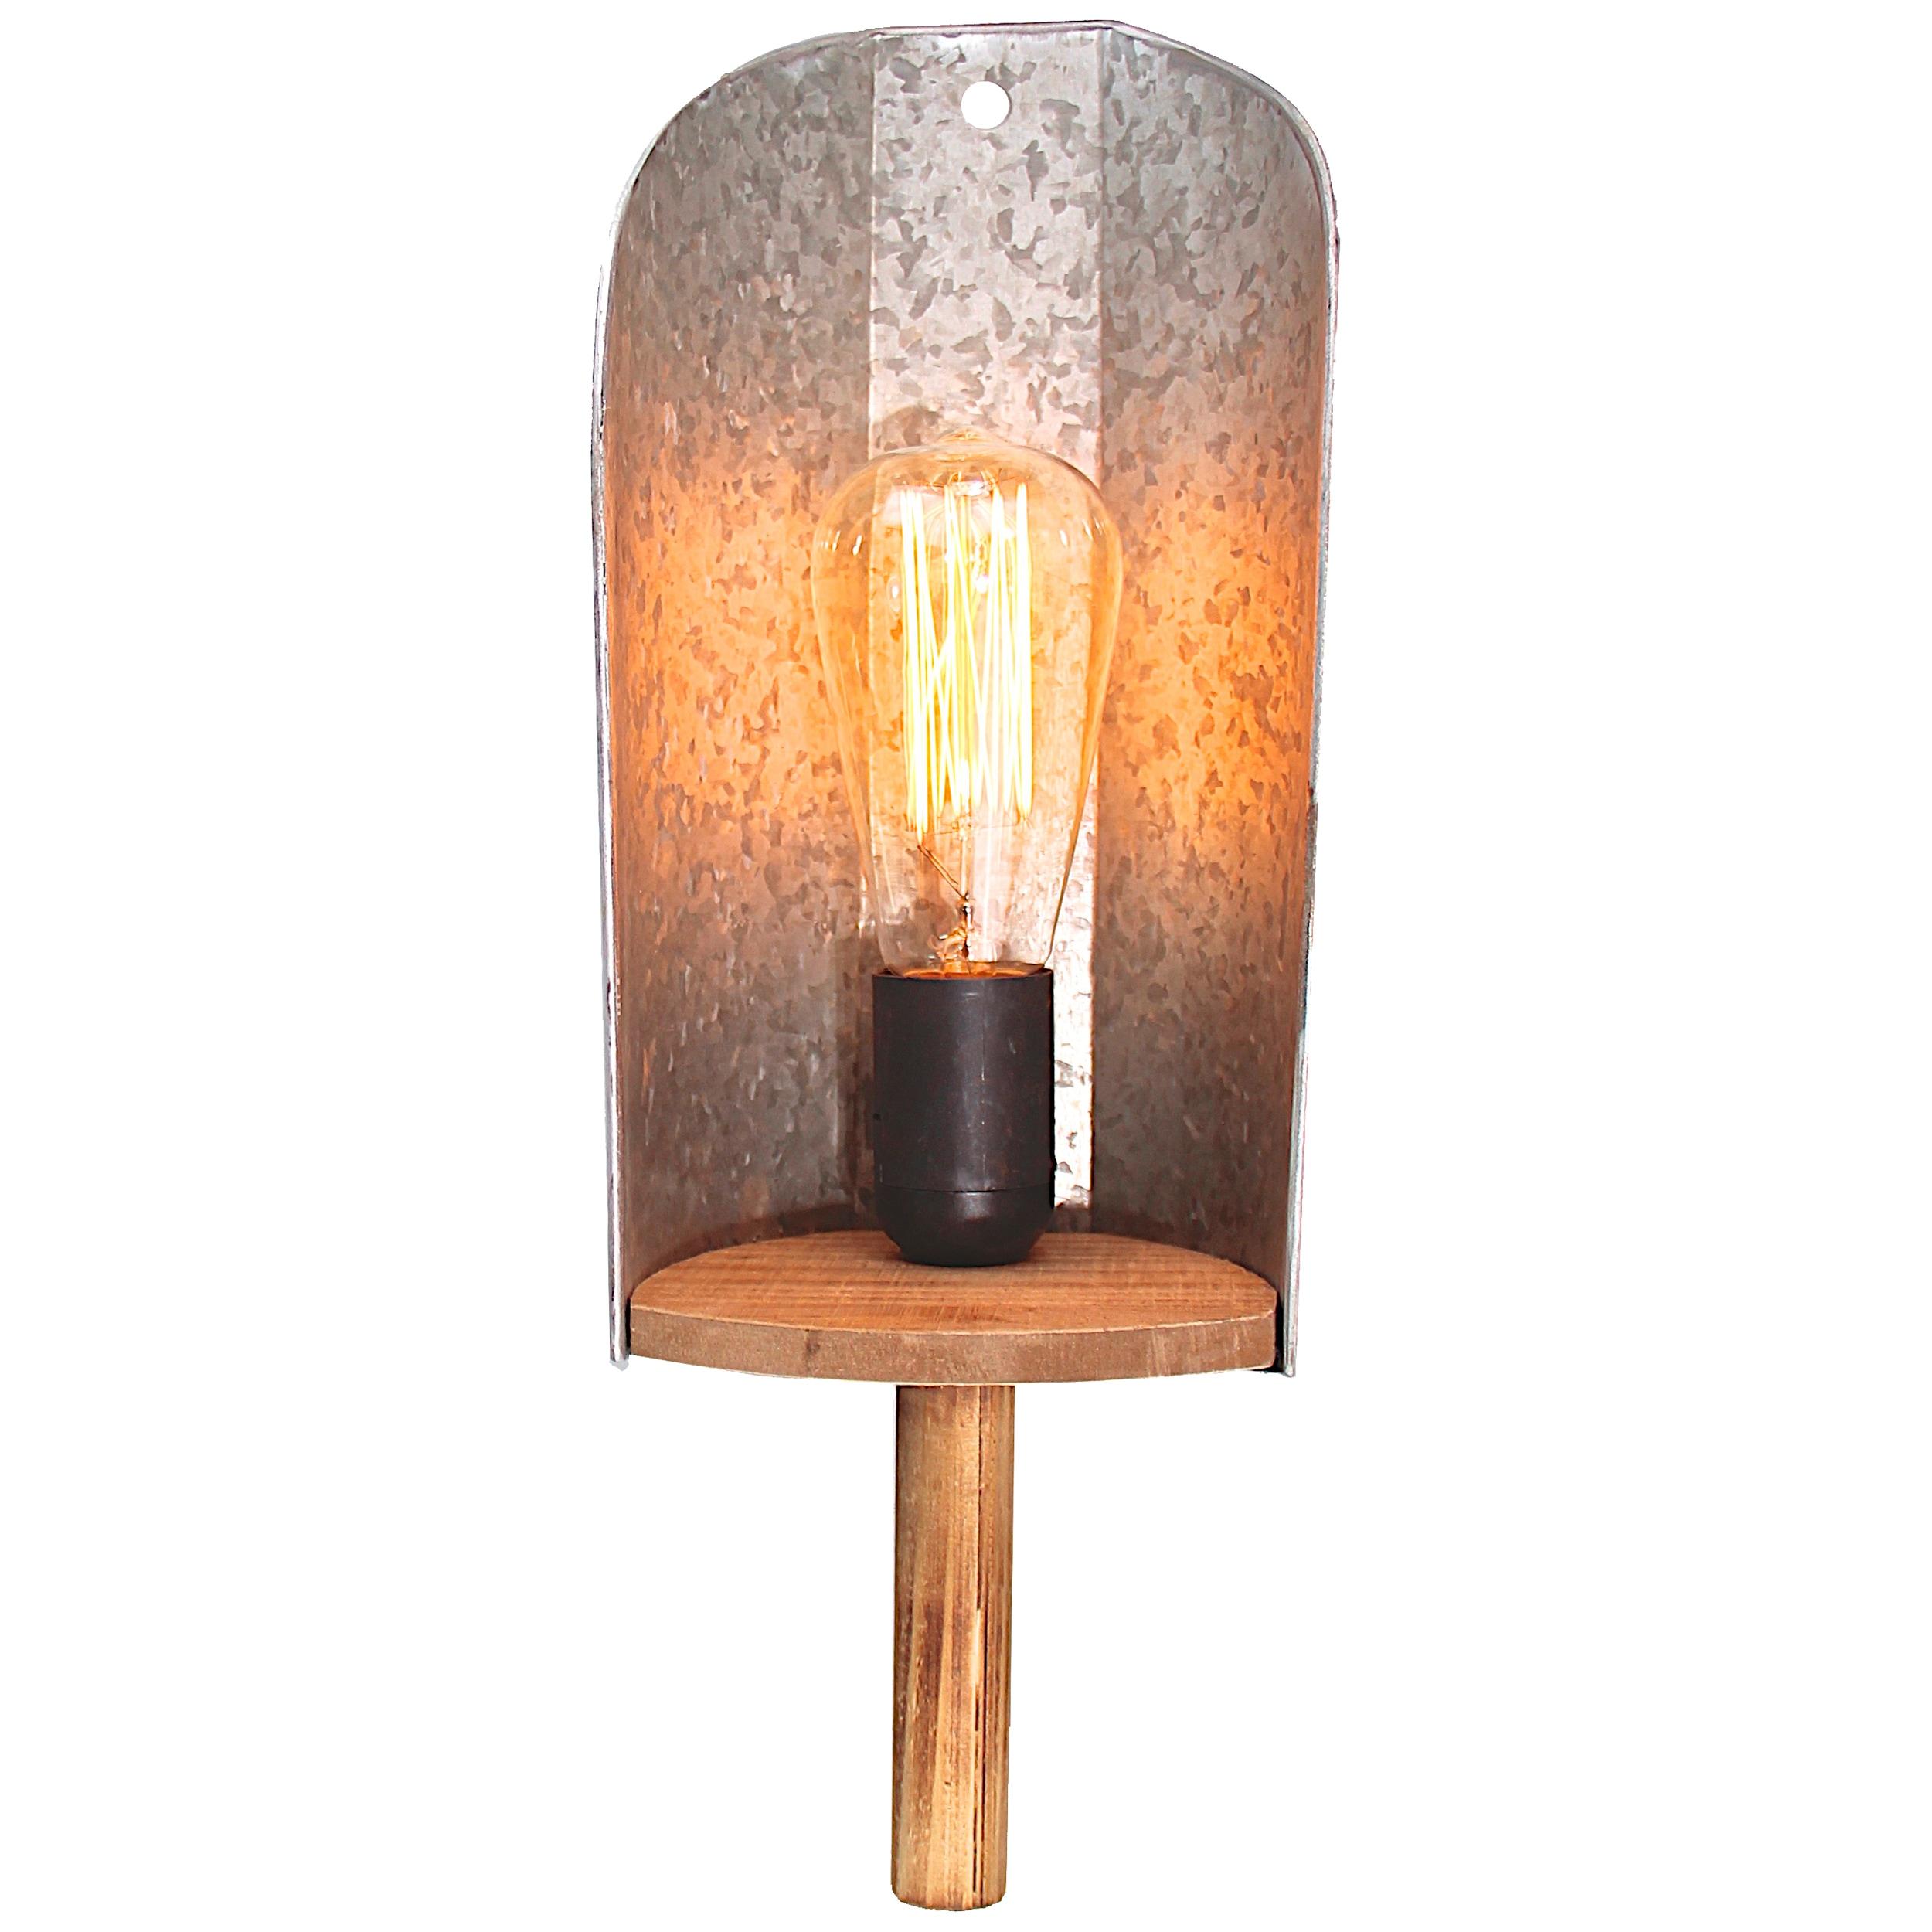 Brilliant Leuchten Shovel Wandleuchte Schalter zink antik